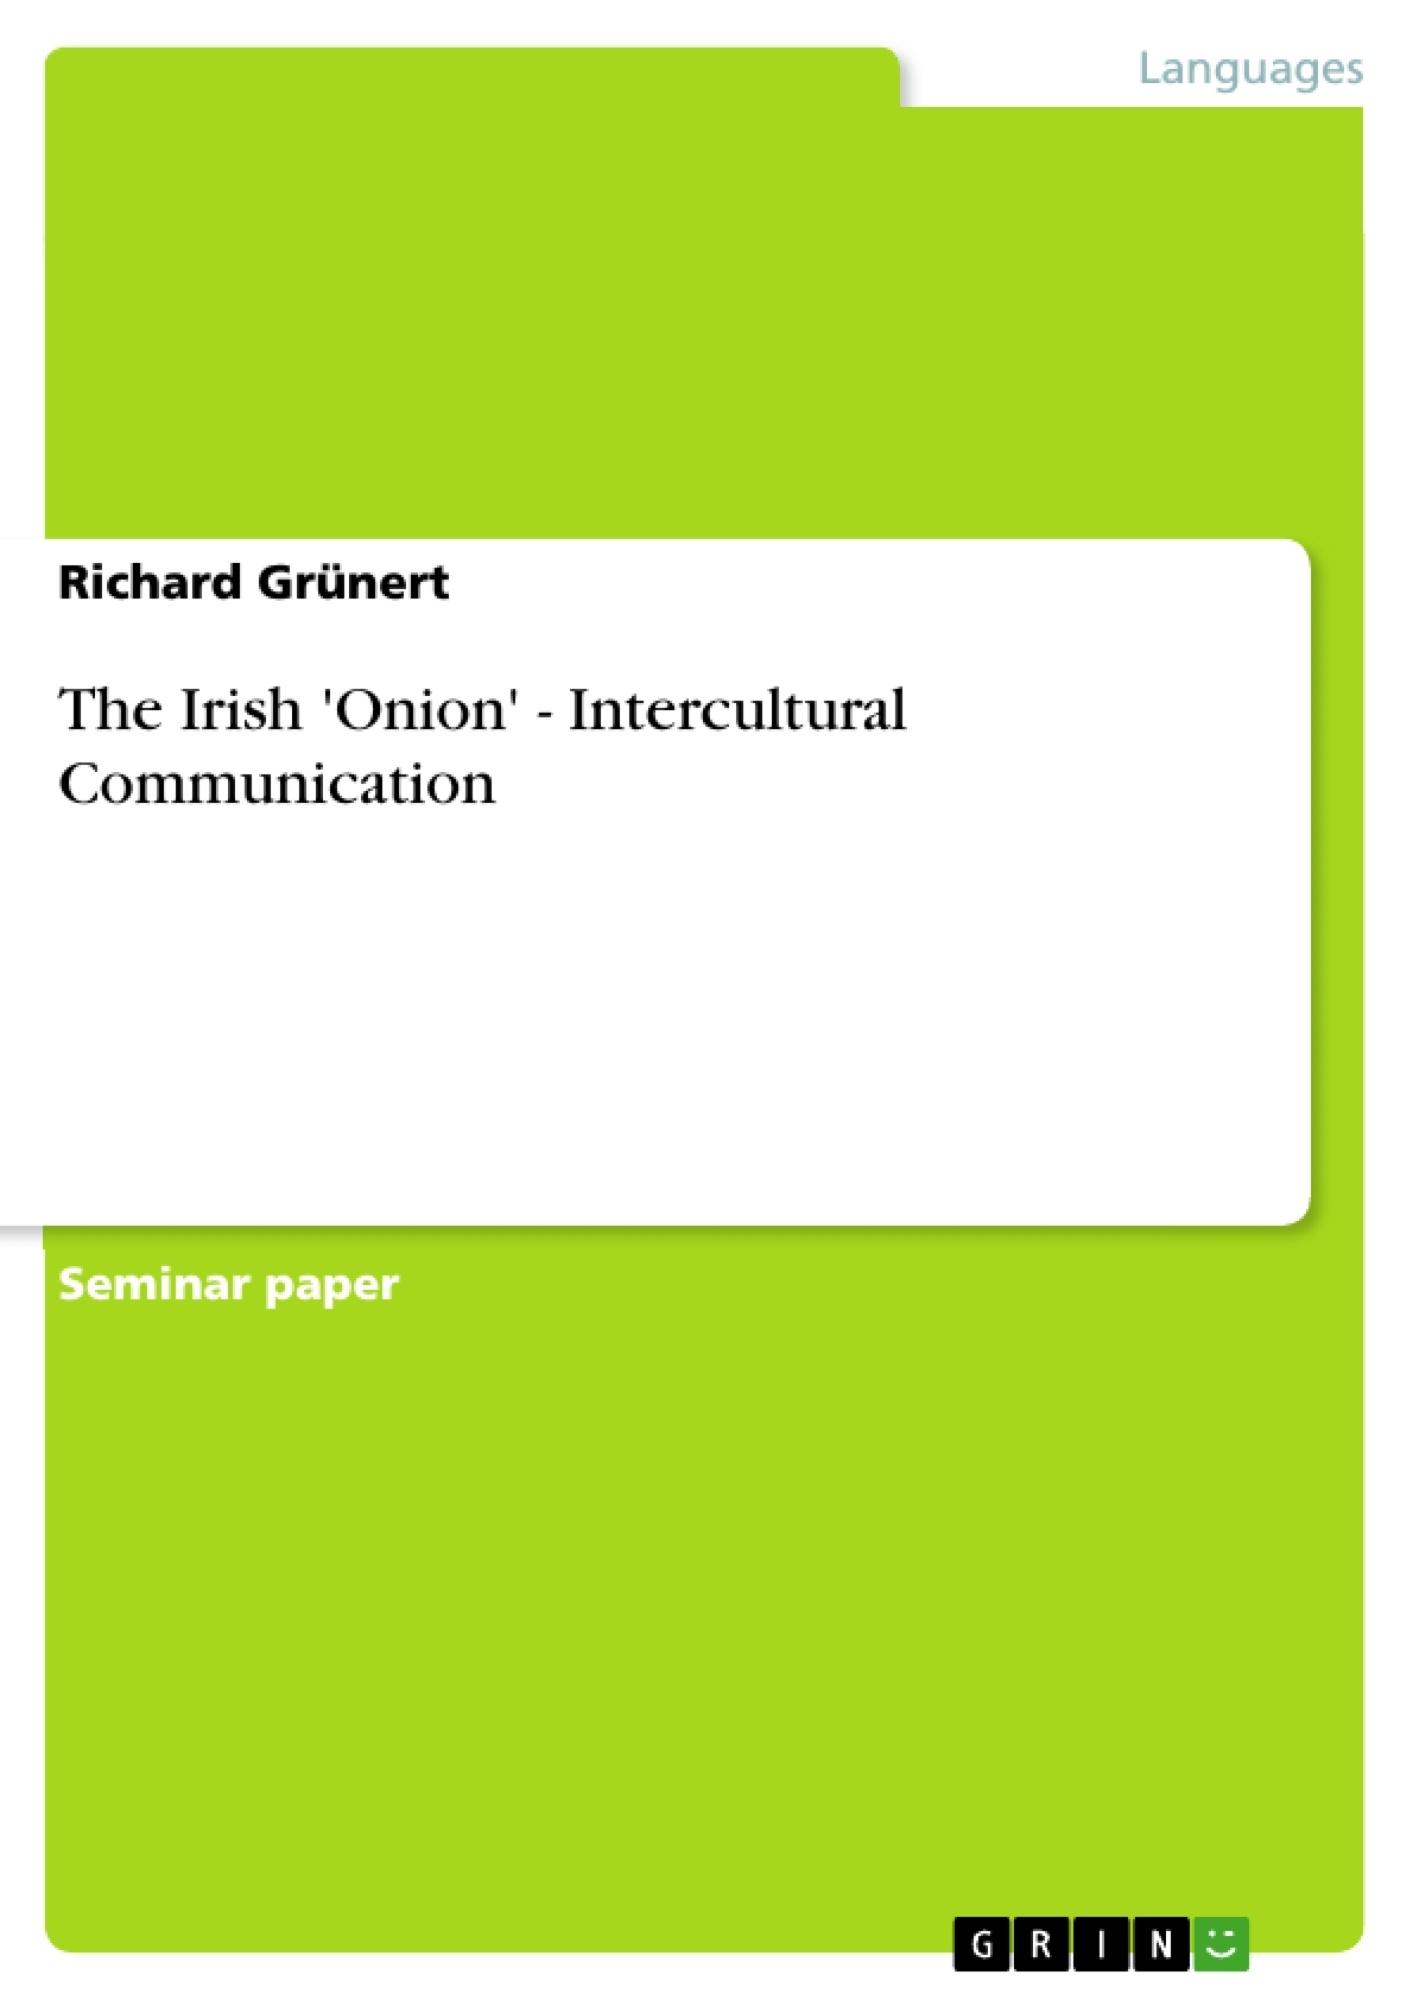 Title: The Irish 'Onion' - Intercultural Communication